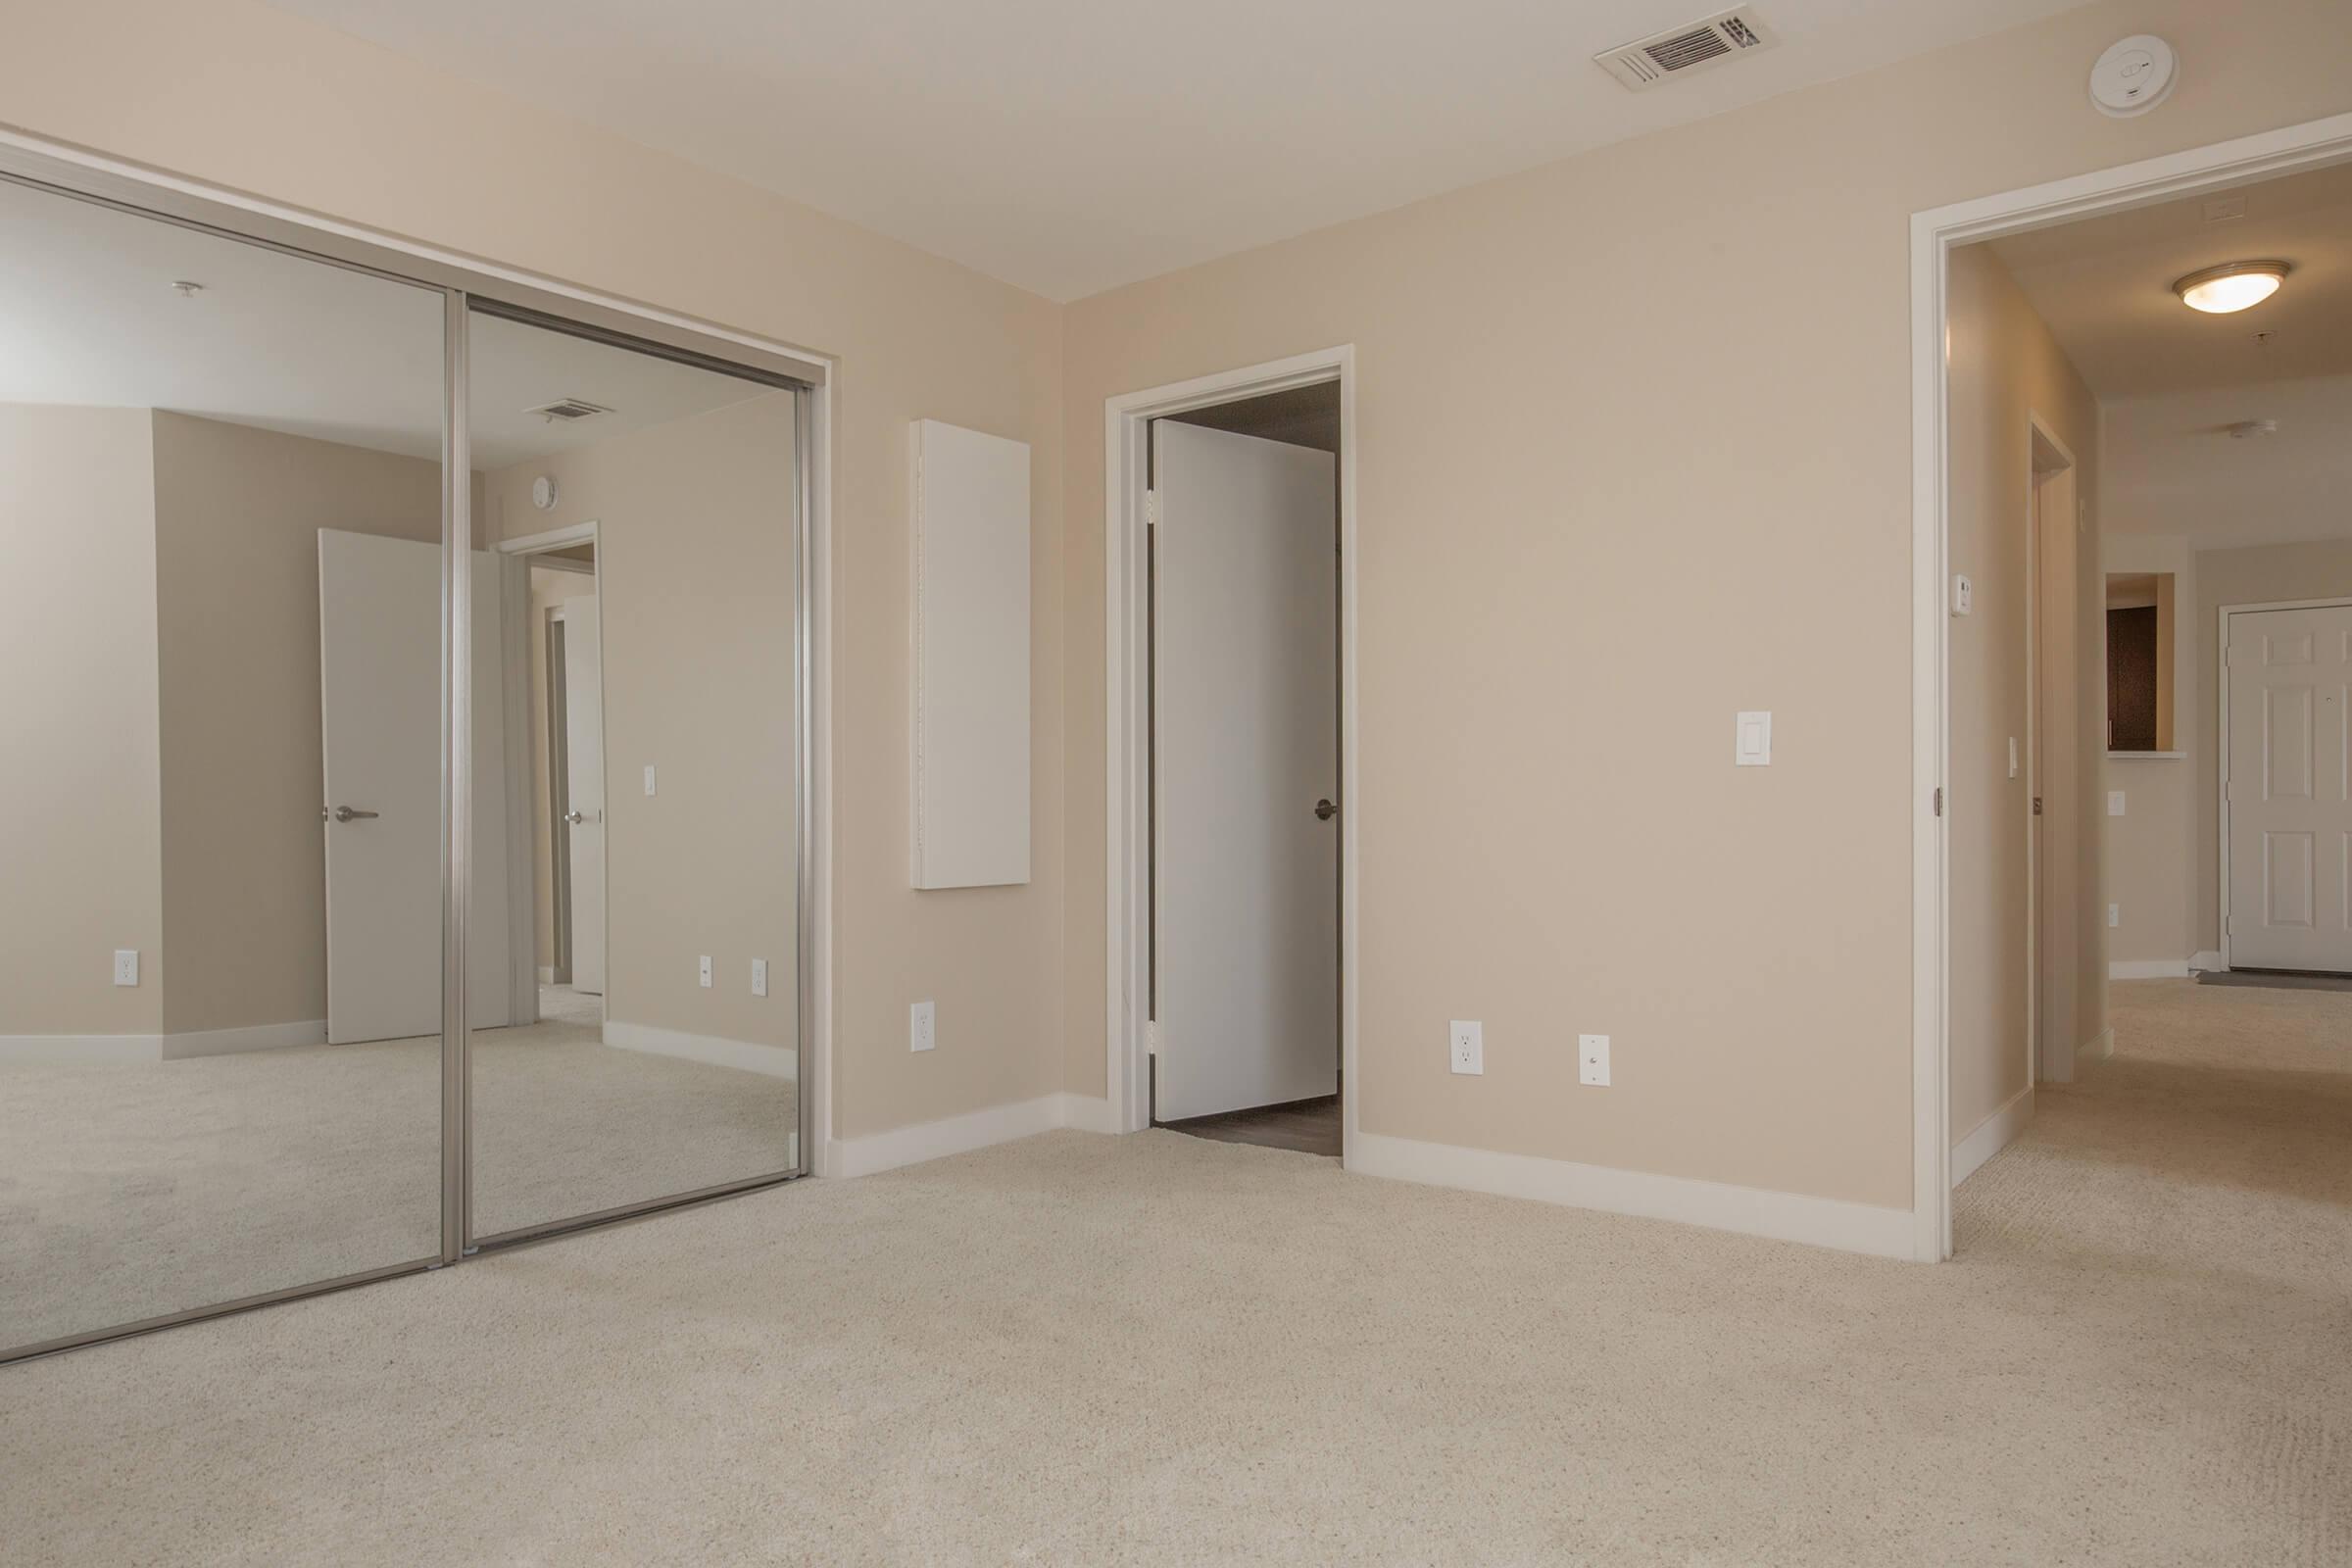 Second bedroom with sliding glass closet doors